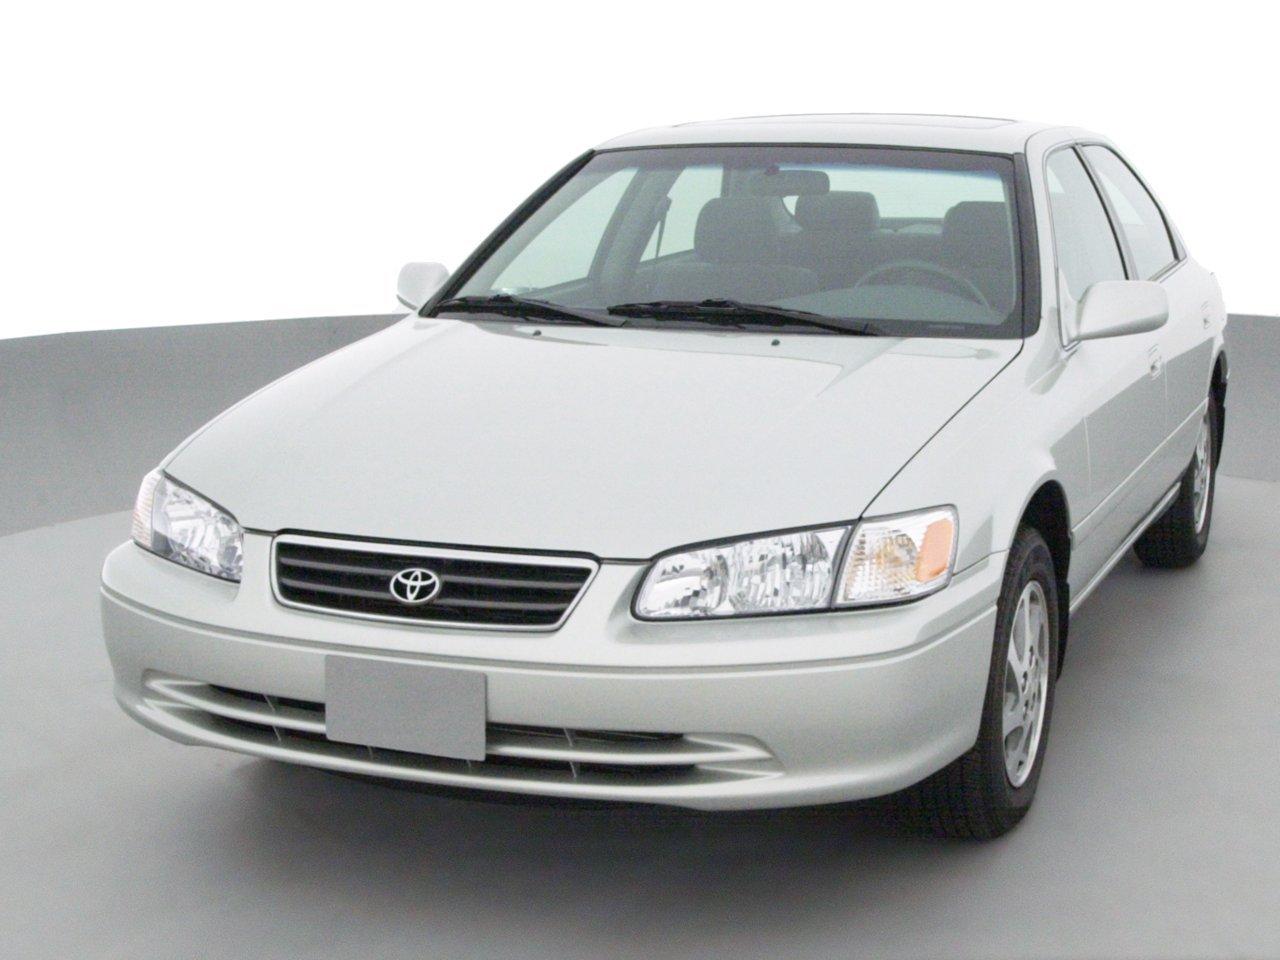 Kelebihan Kekurangan Toyota 2001 Review